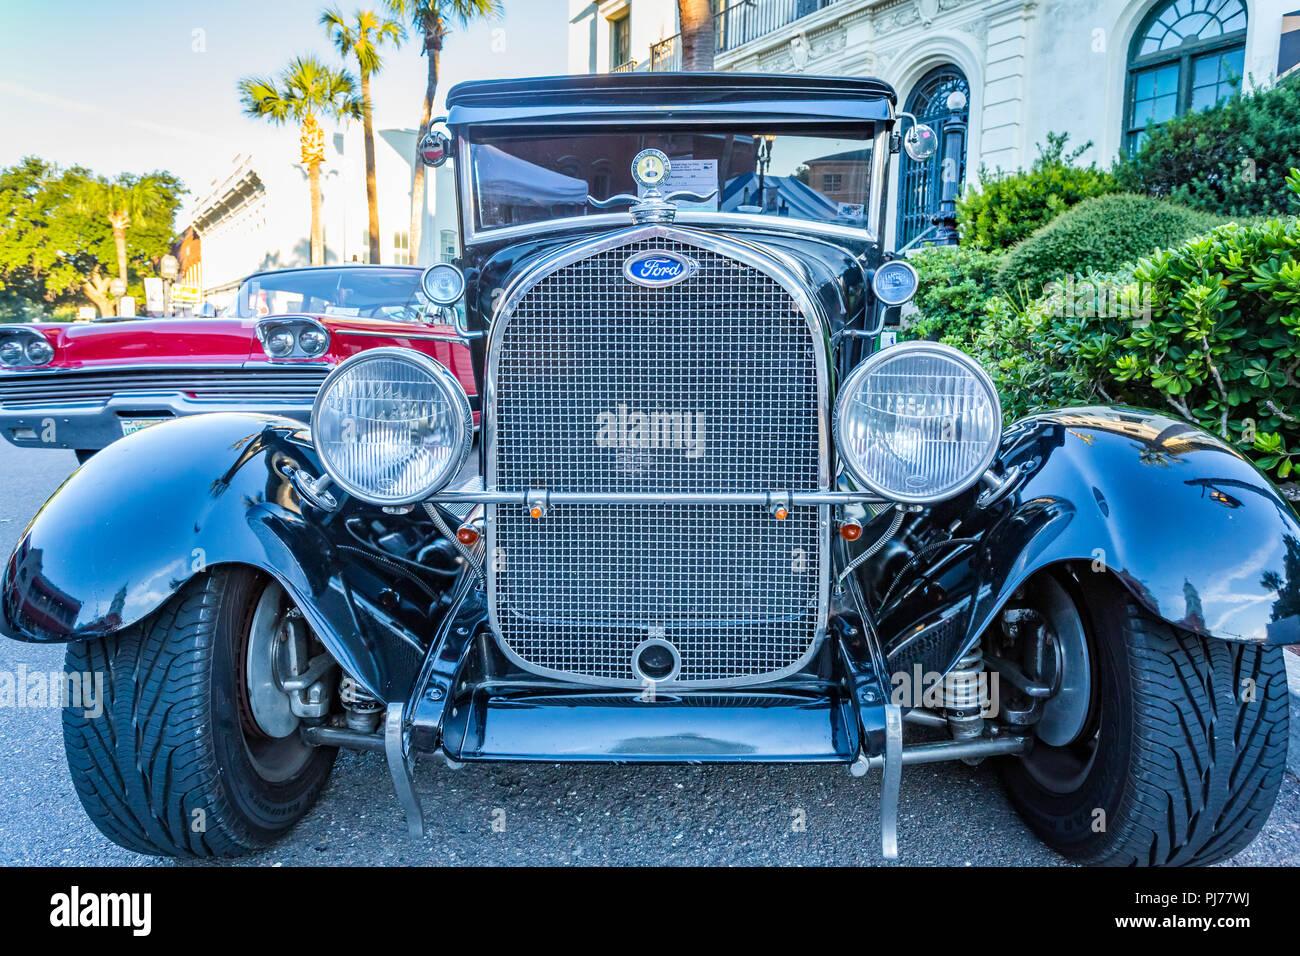 Customized Ford Model A At A Classic Car Show In Amelia Island - Amelia car show